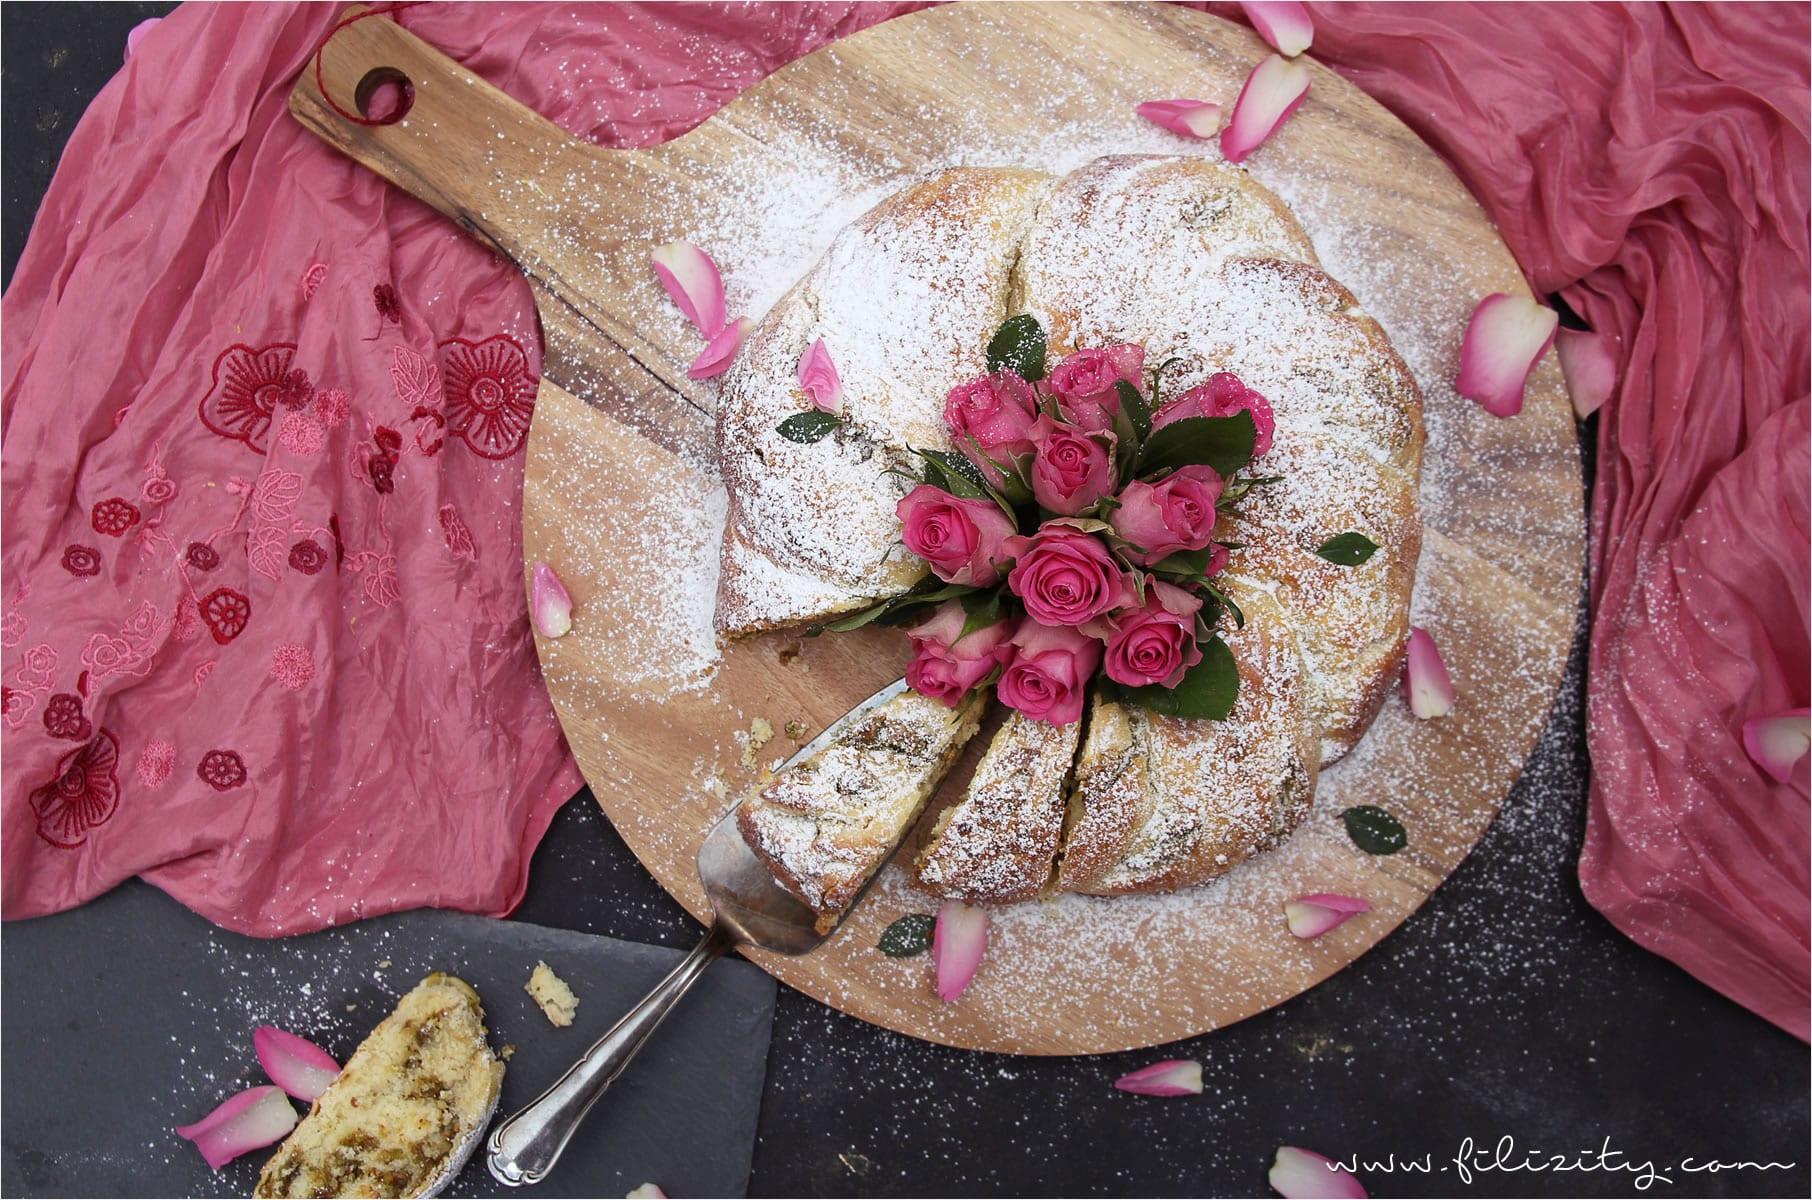 rezept_oster-kranz_pistazie-rosenwasser_hefe-teig-zopf_food0-min